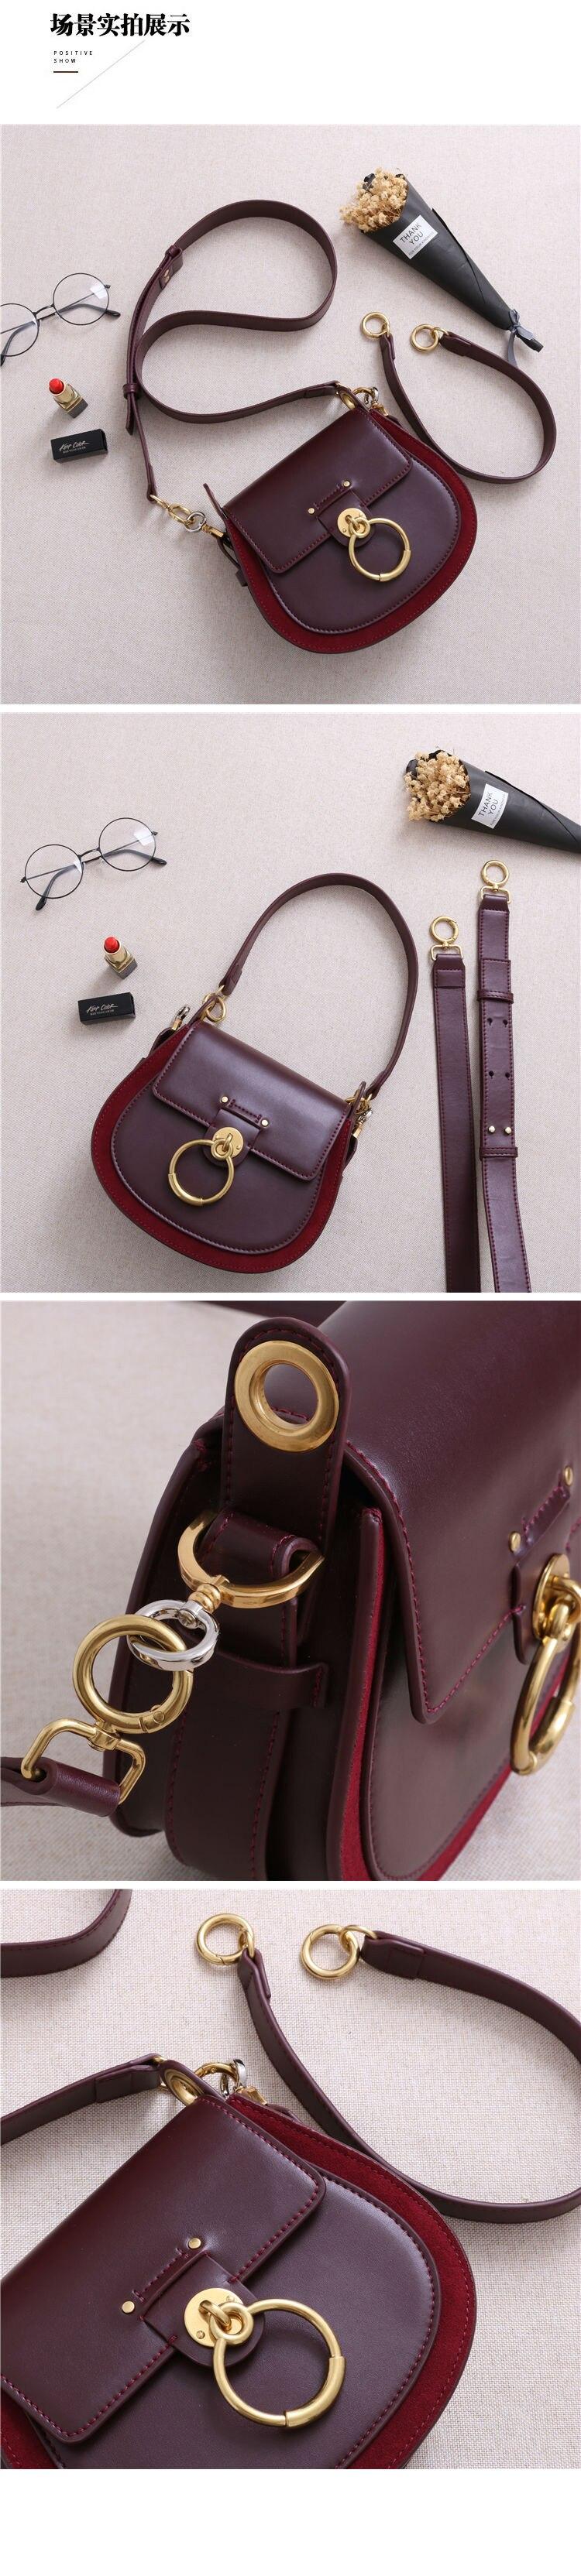 92e29d9ee560 Luxury Handbags Women Bags Fake Designer Genuine Leather Shoulder Bag  Famous Brands Runway Fashion Bags ...